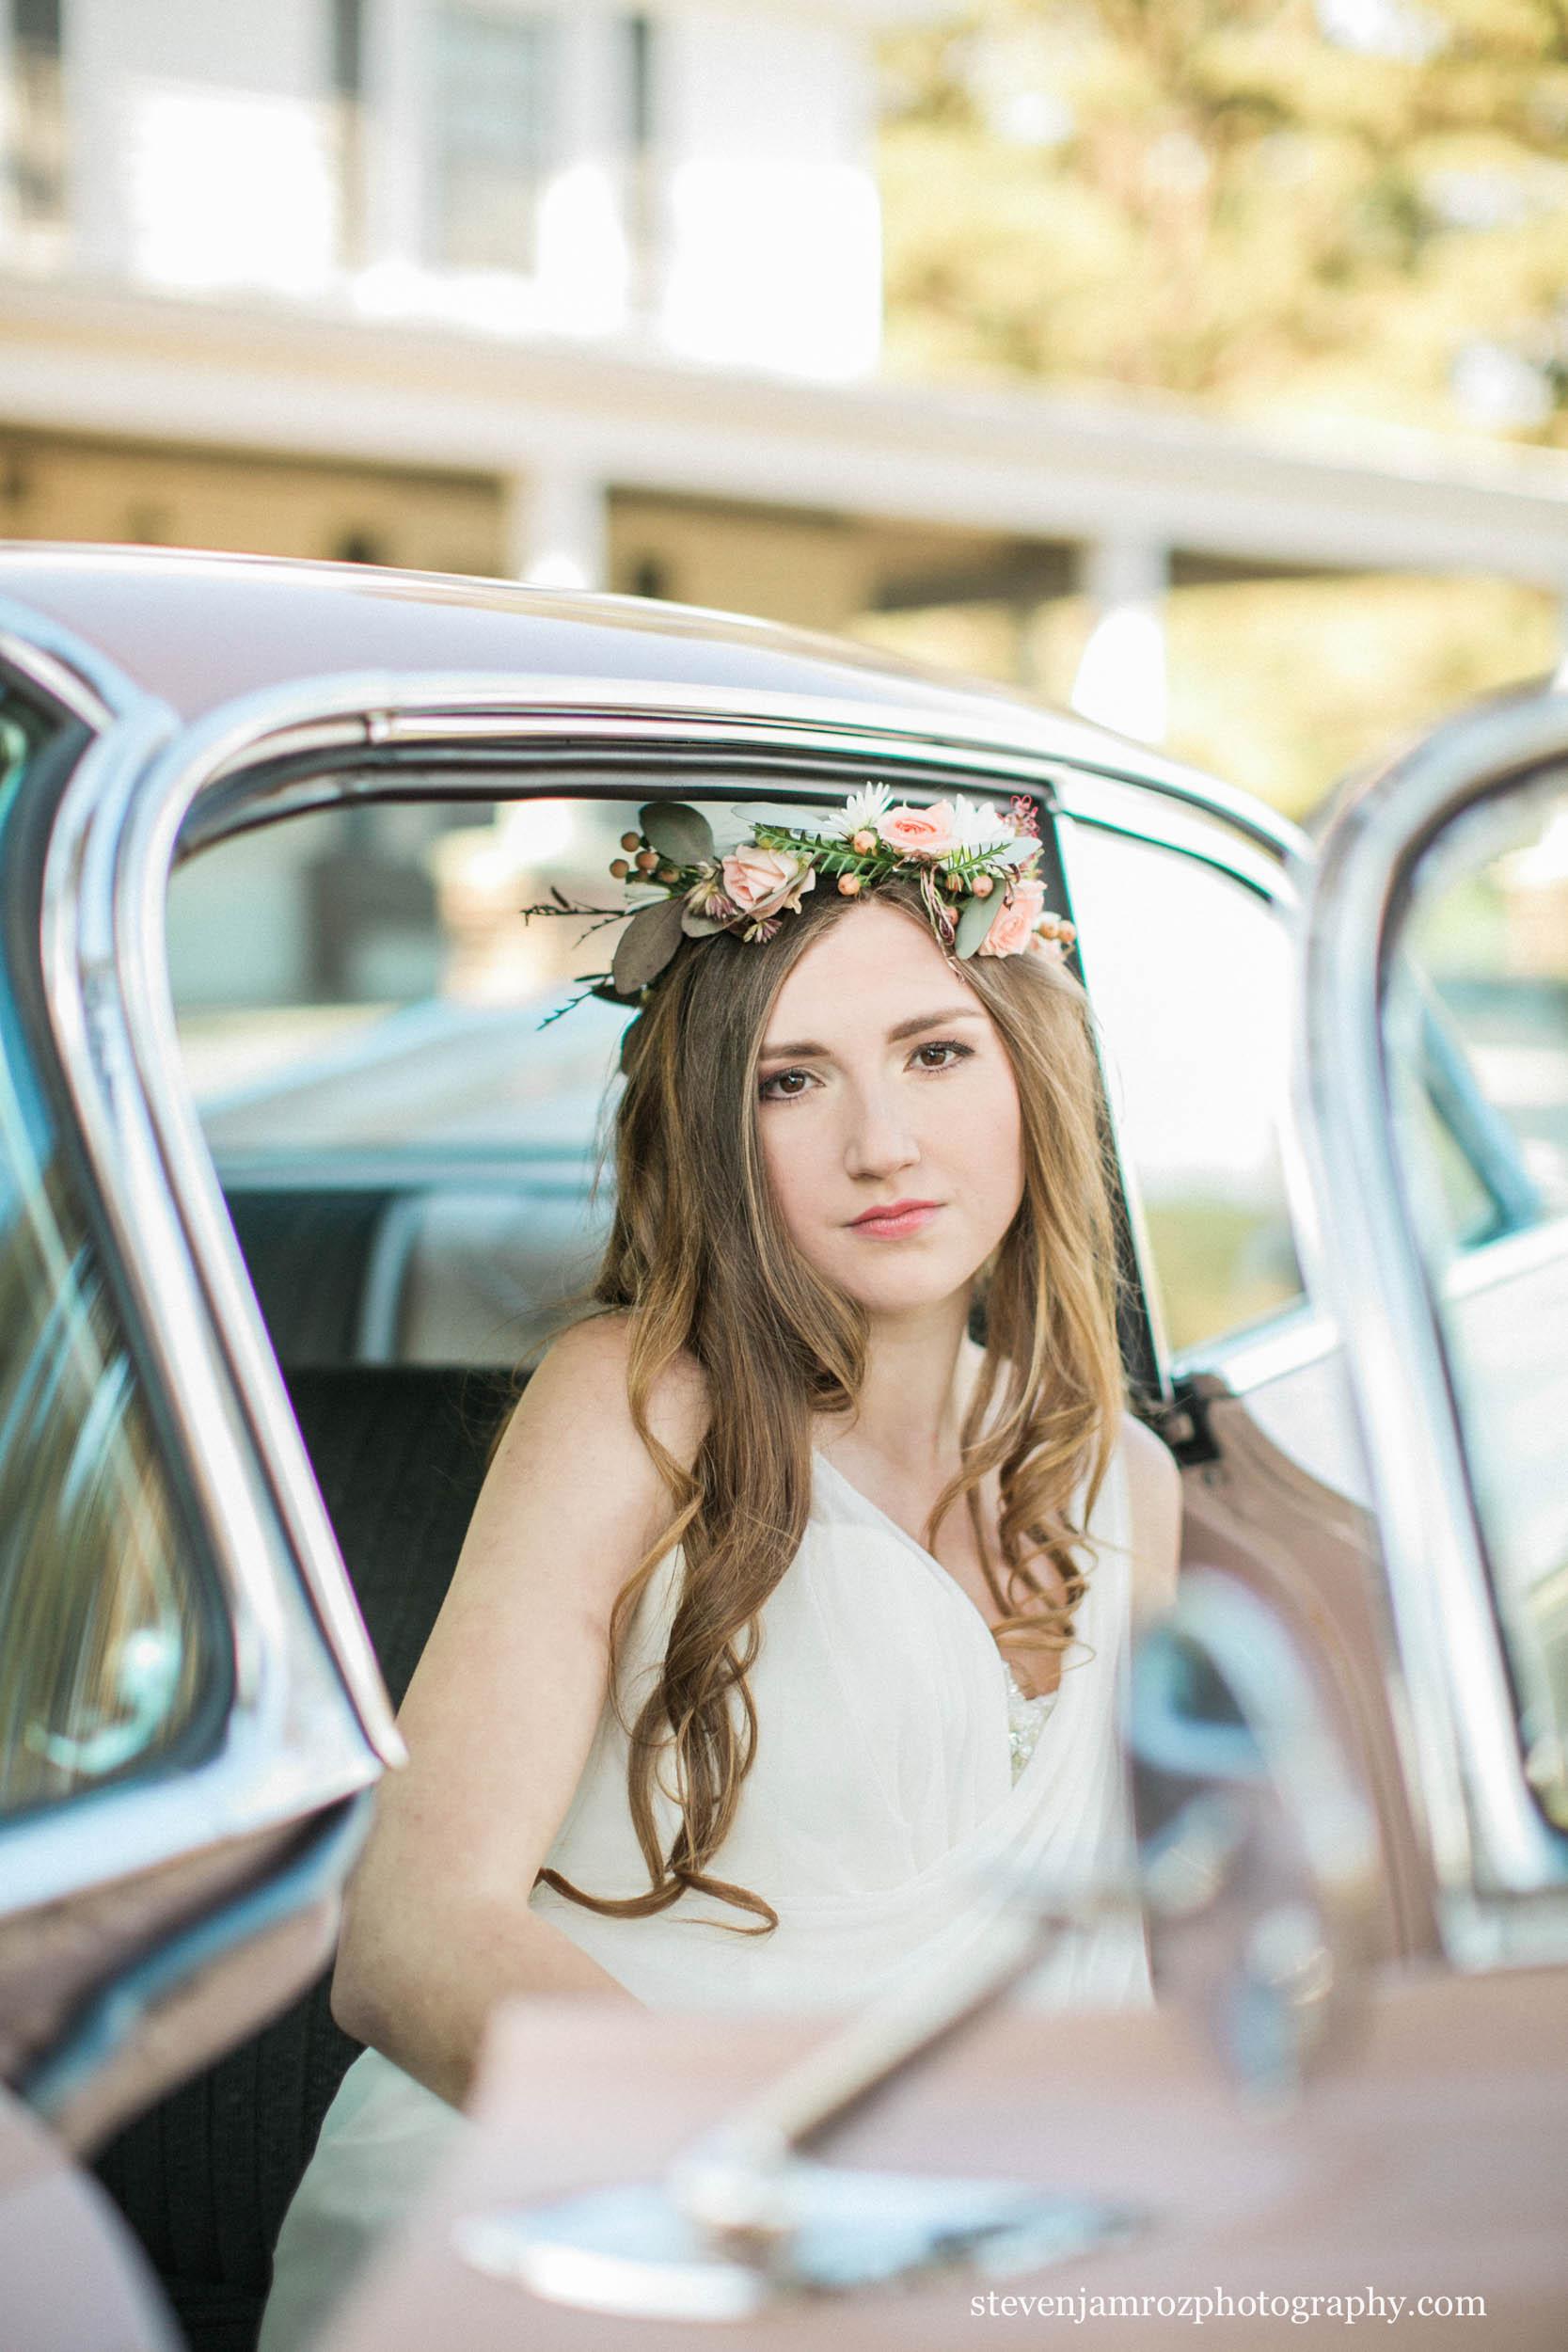 pretty-bride-flowers-styled-wedding-shoot-raleigh-nc.jpg